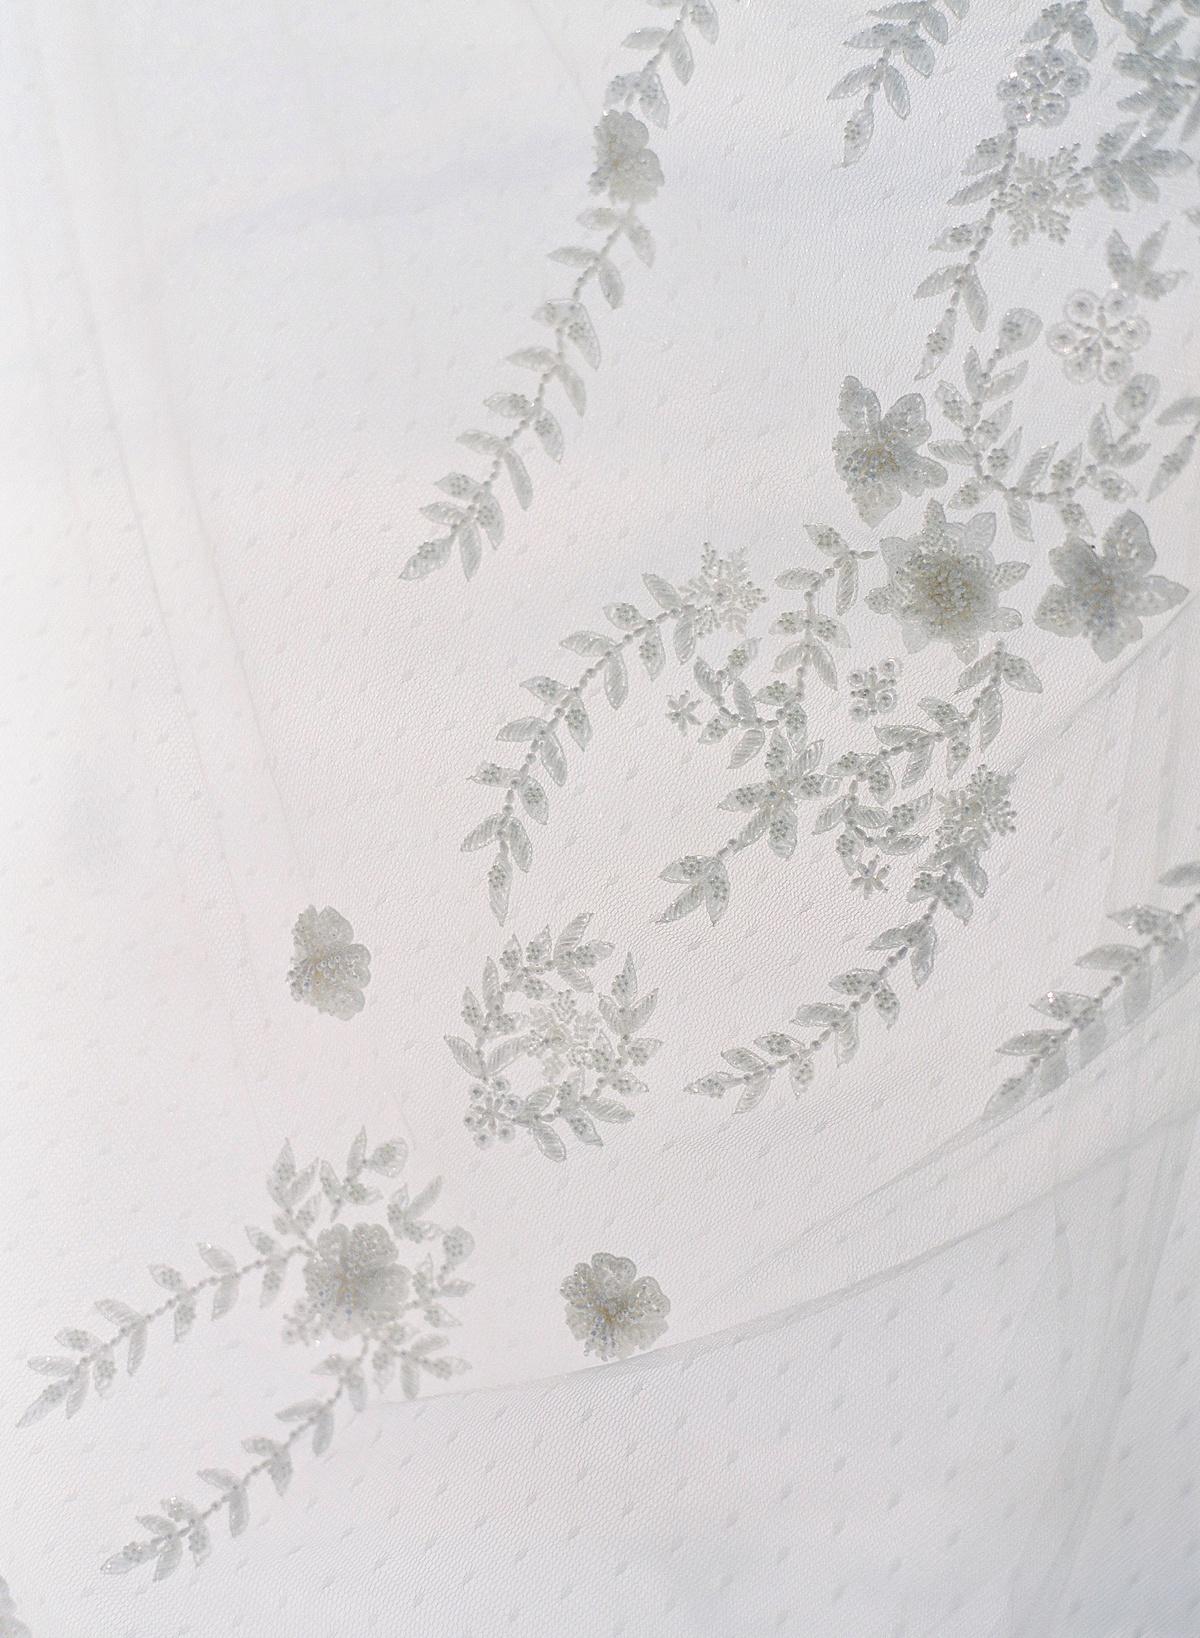 veil-details.jpg